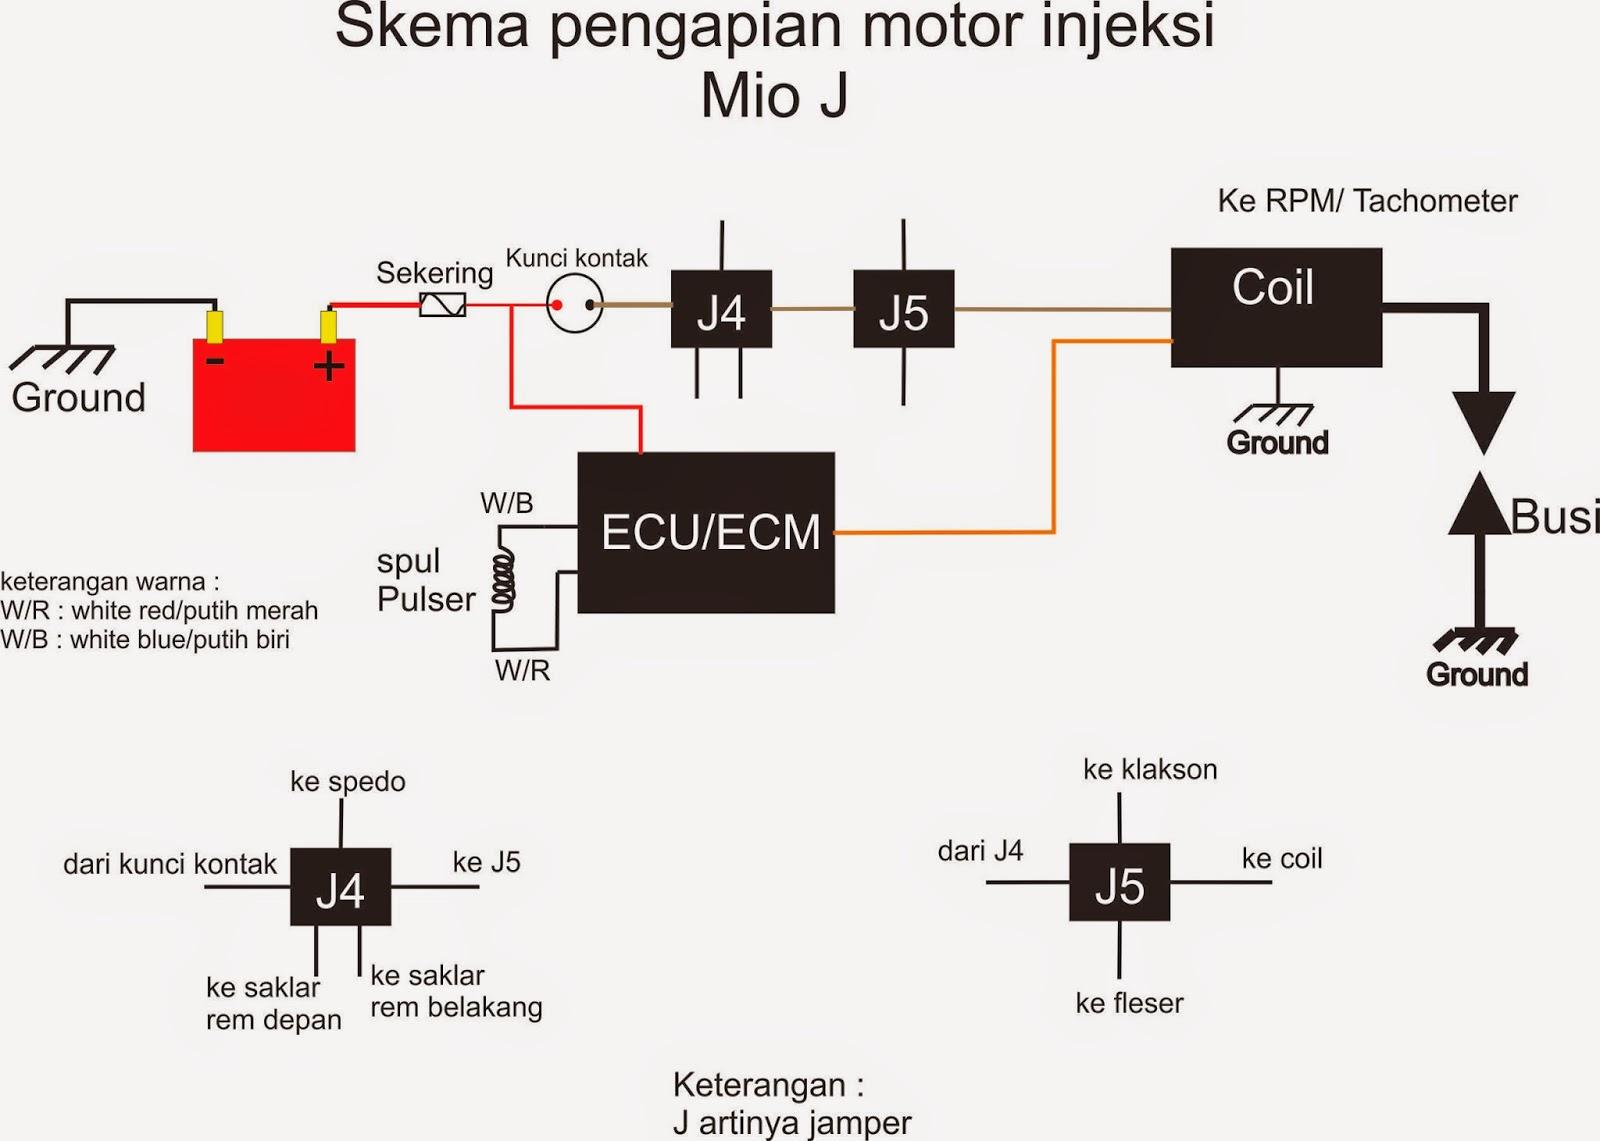 Sistem pengapian motor injeksi